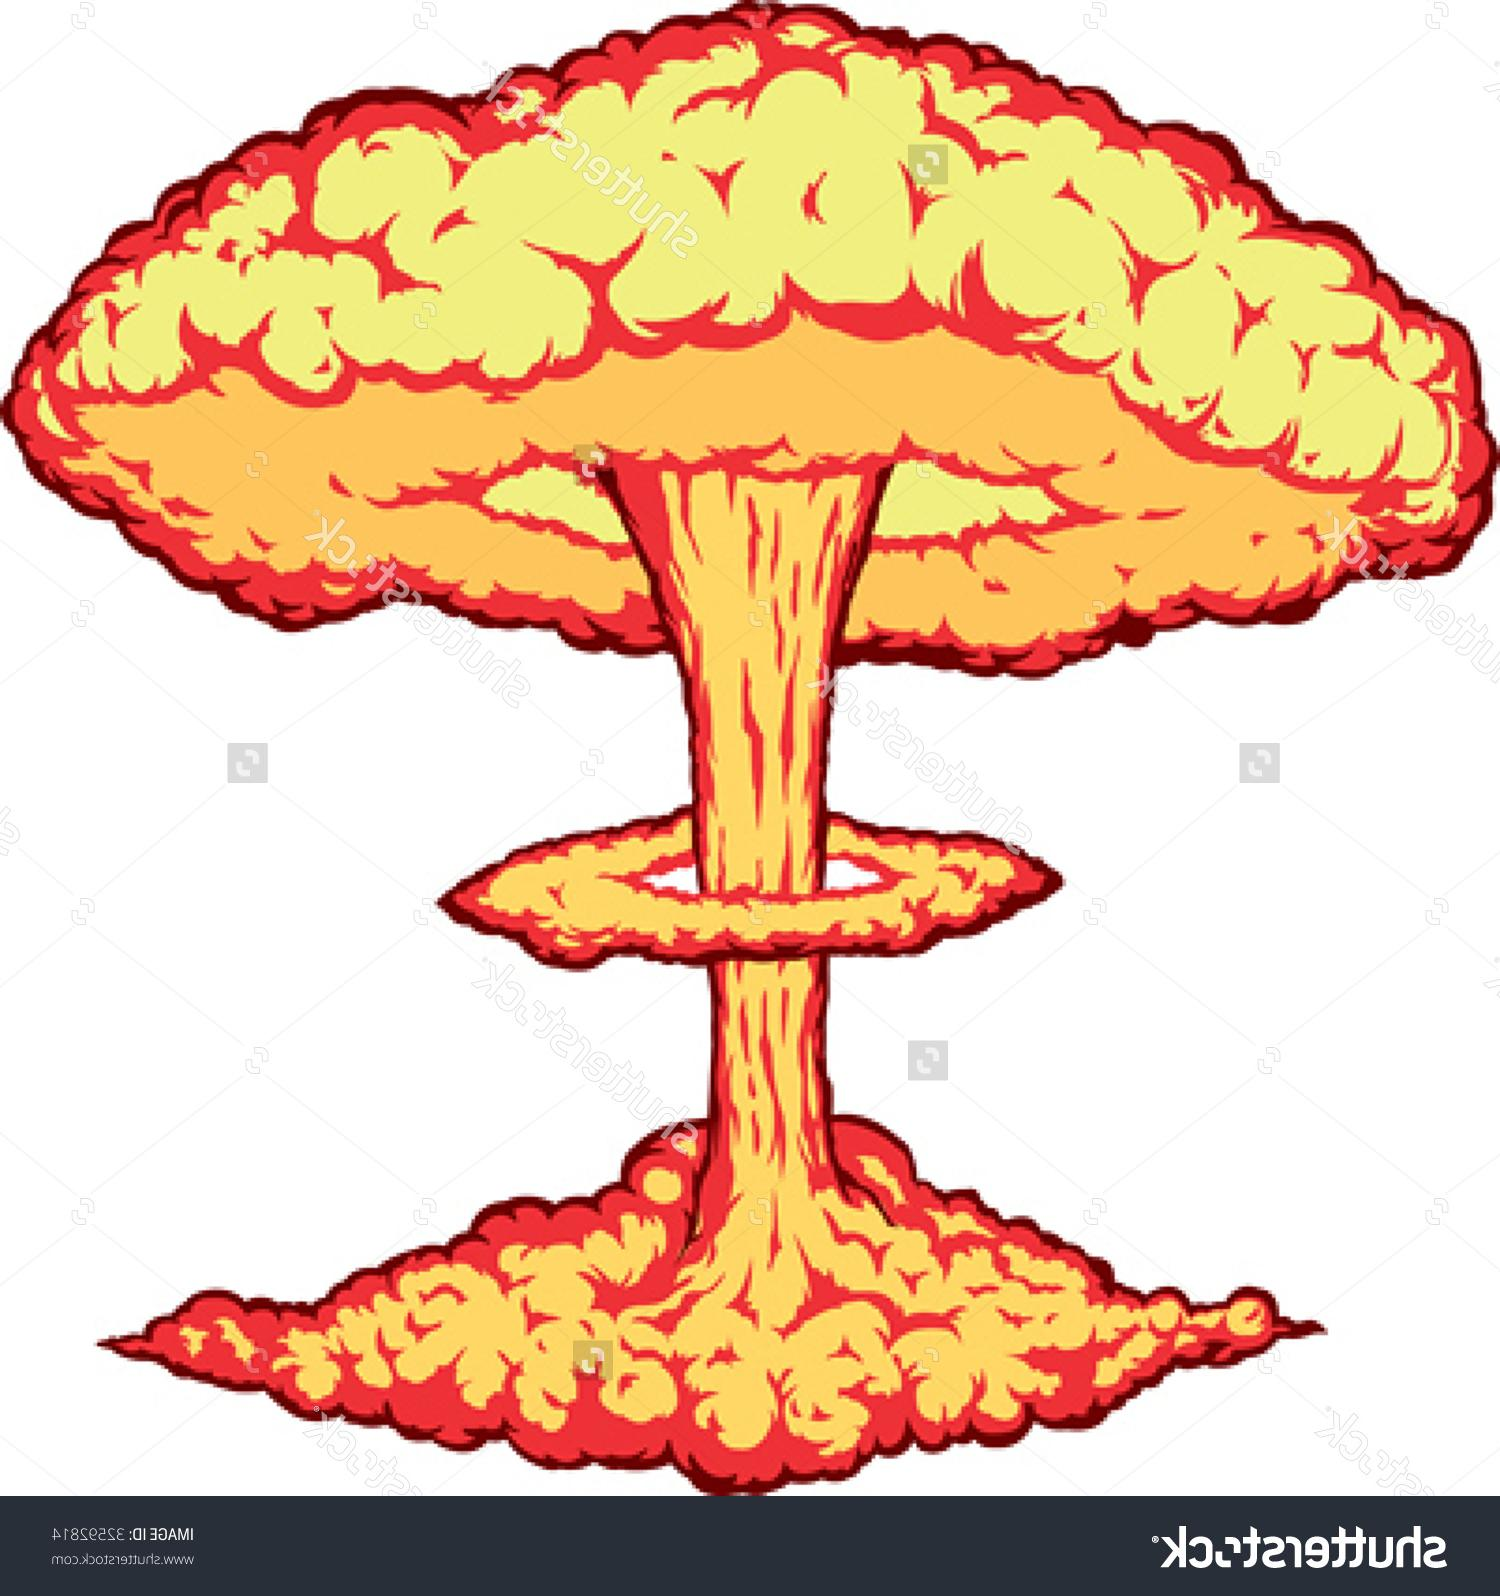 Explosions clipart mushroom cloud Cloud Drawing Art Images »